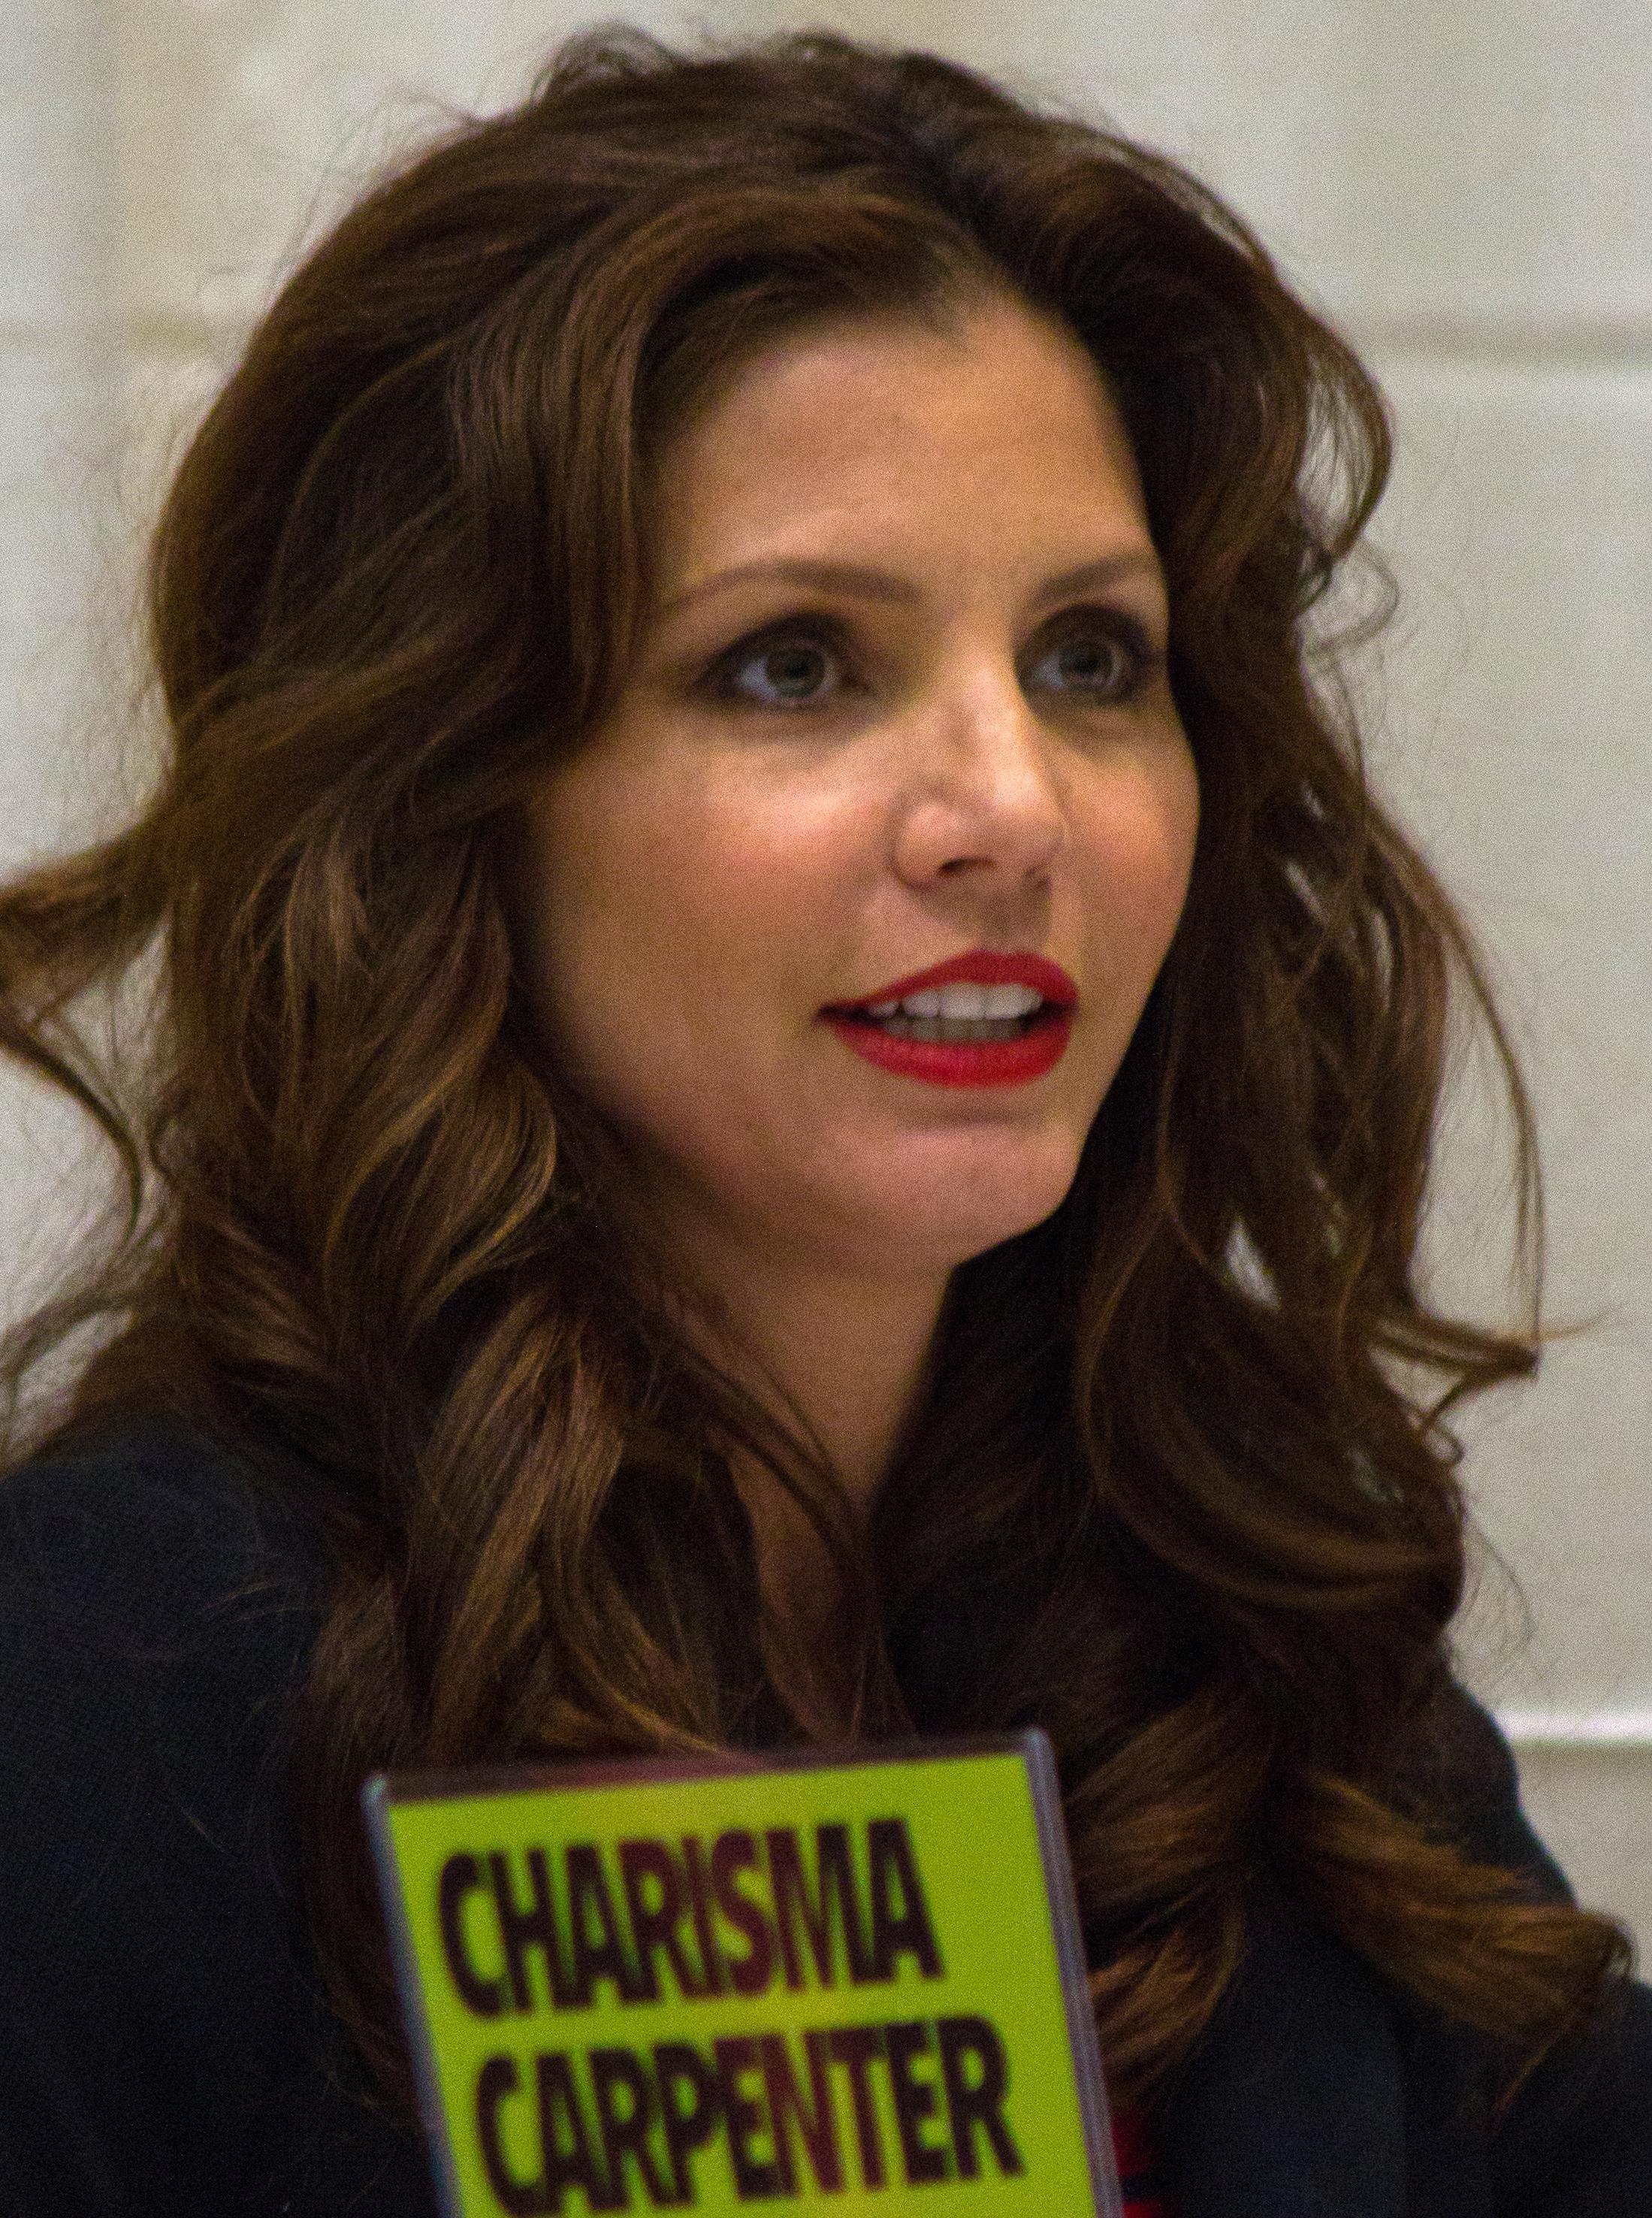 Charisma Carpenter Height File:charisma Carpenter